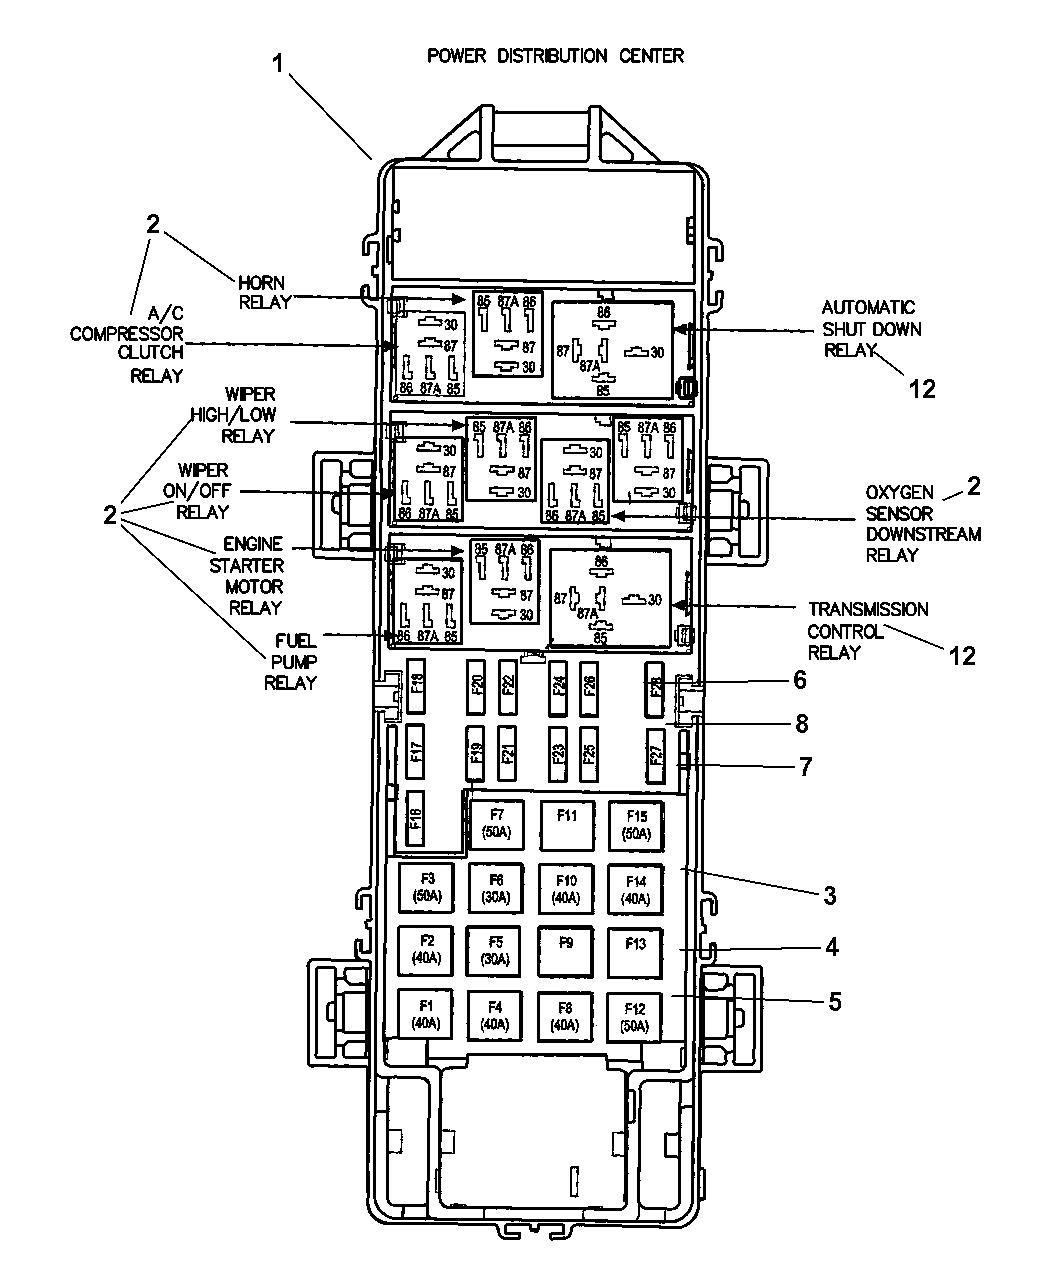 Wiring Diagram PDF: 2003 Jeep Grand Cherokee Fuel Pump